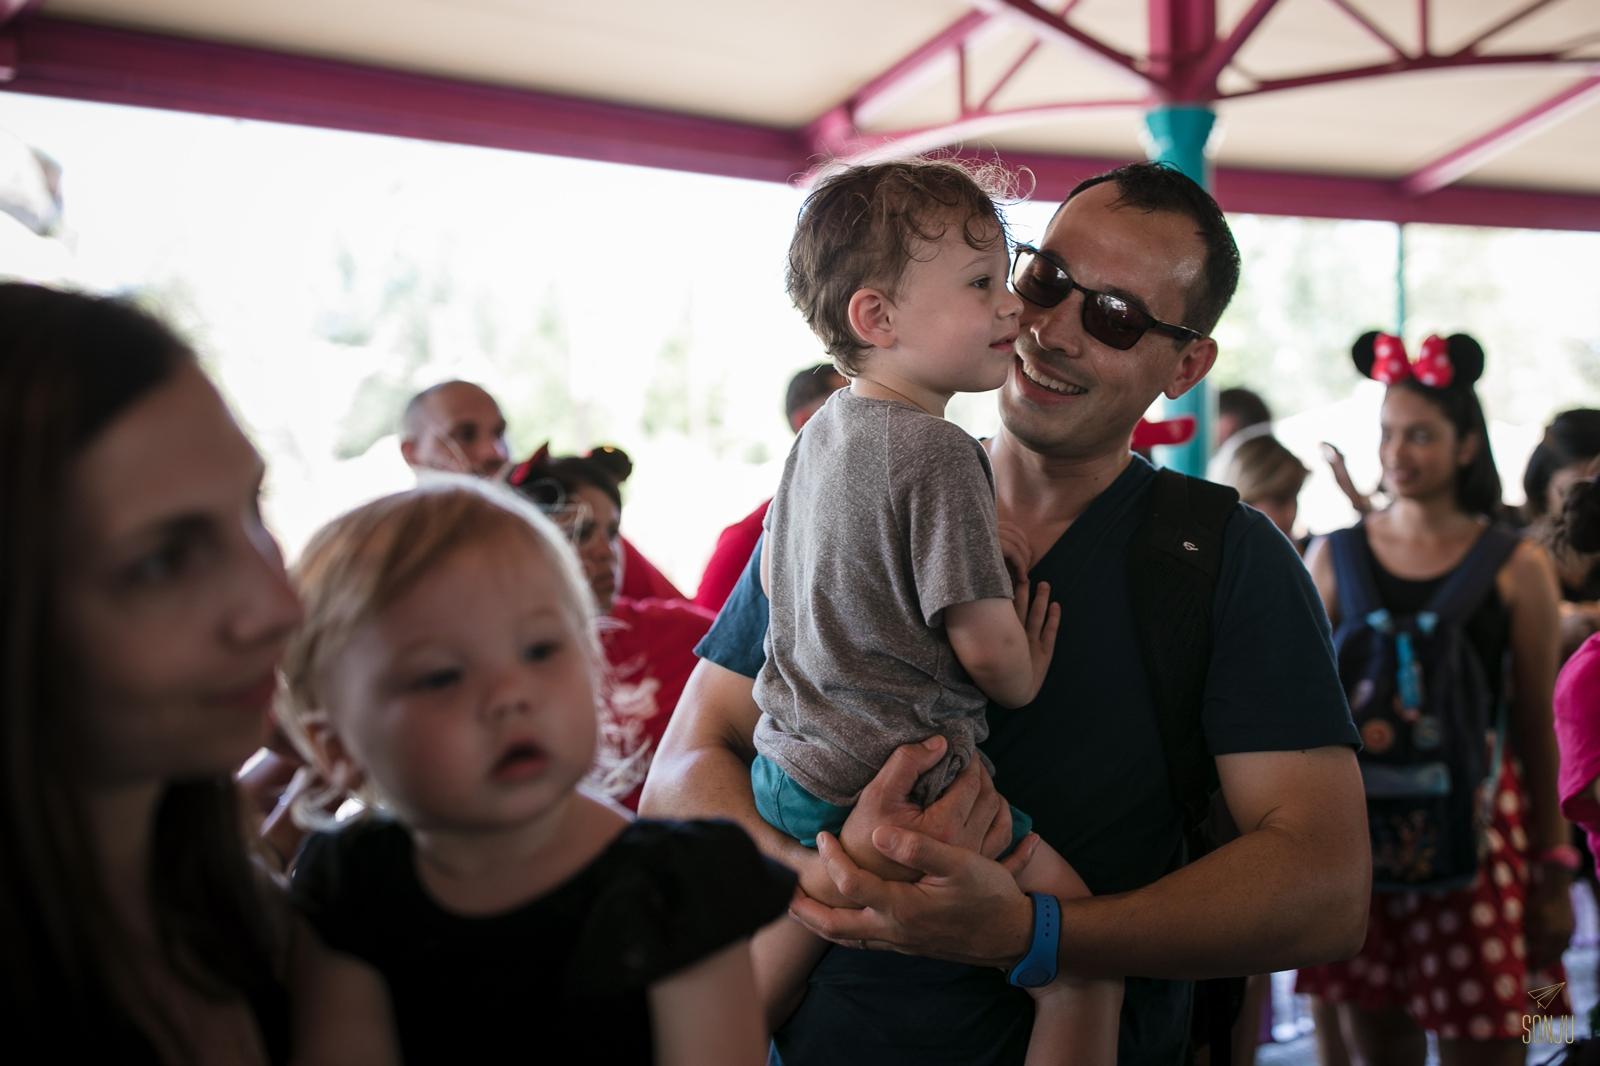 Central-Orlando-Theme-Park-Family-Photography00016.jpg